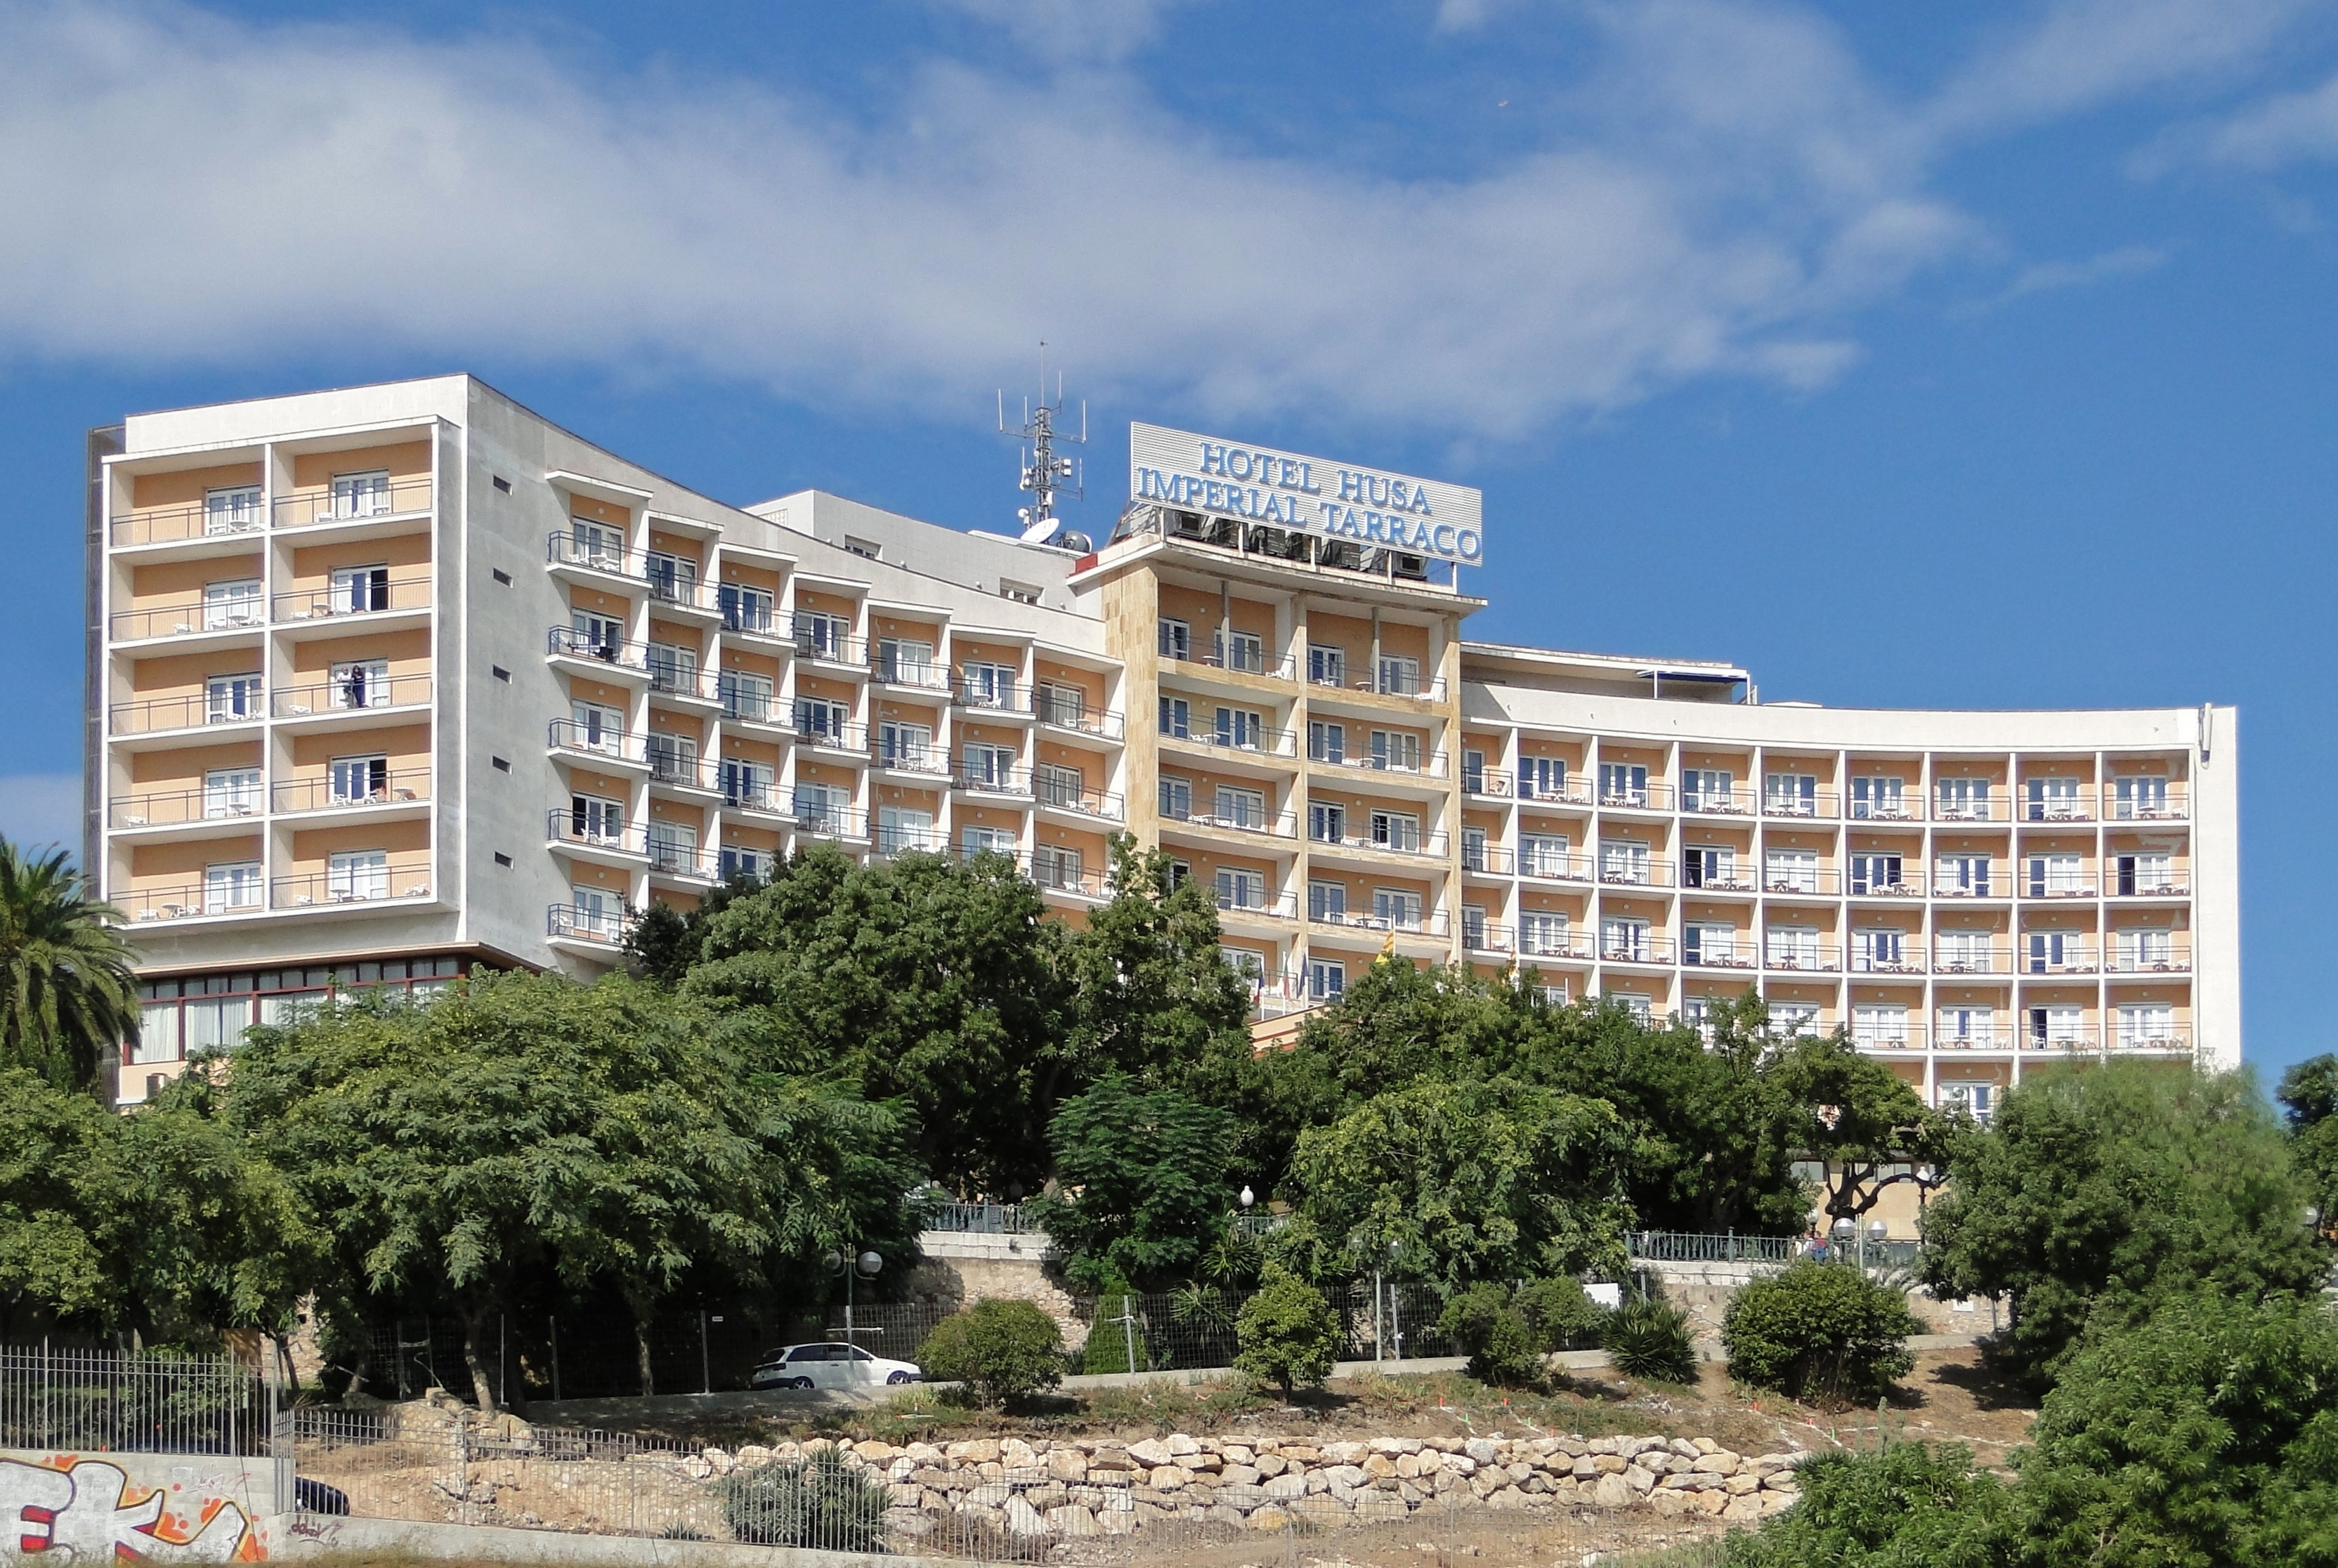 Husa President Park Hotel Brubels Tripadvisor